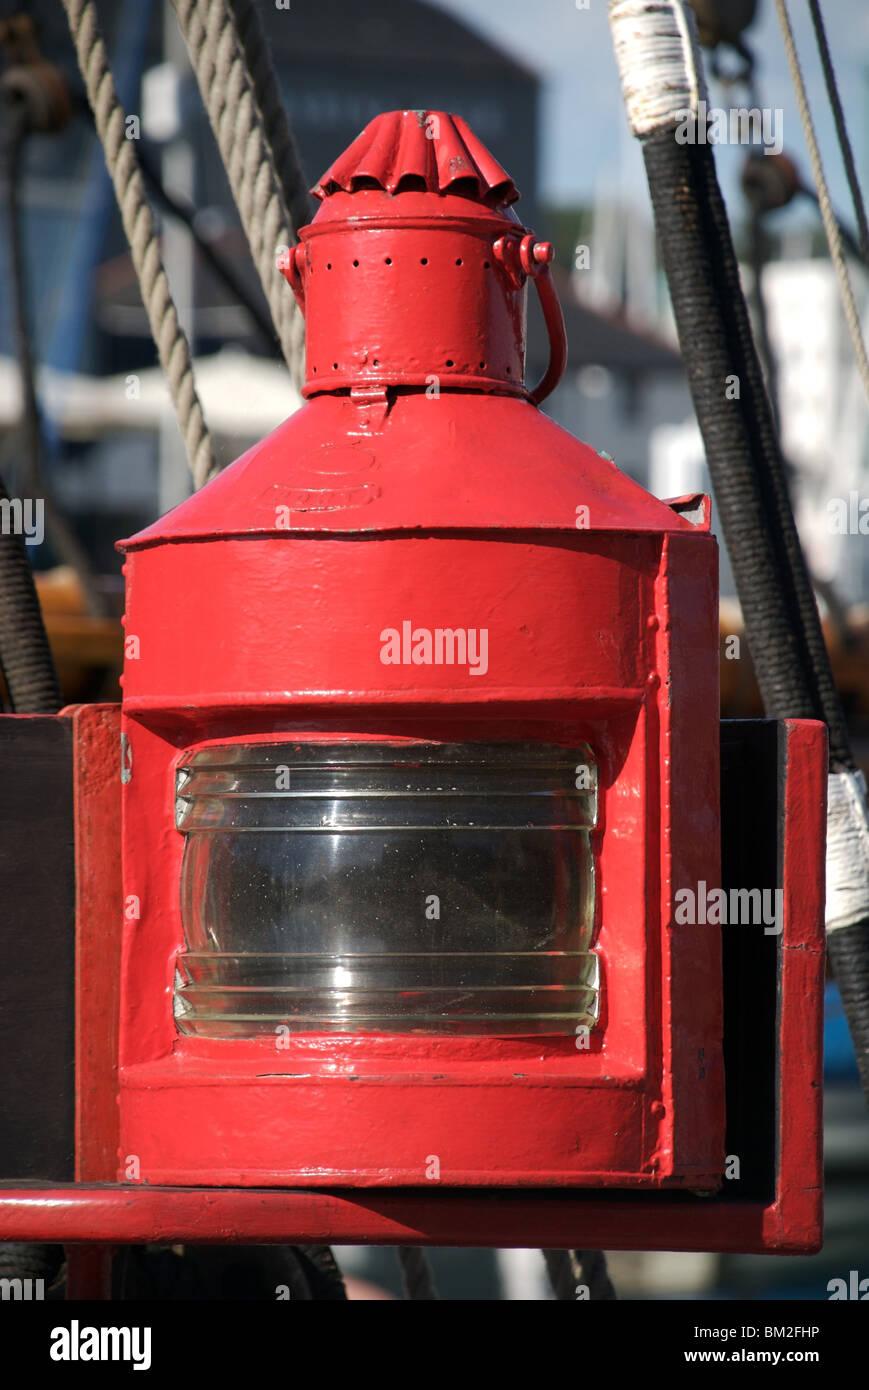 Red port lantern in sunlight on old ship, Plymouth, Devon, UK - Stock Image